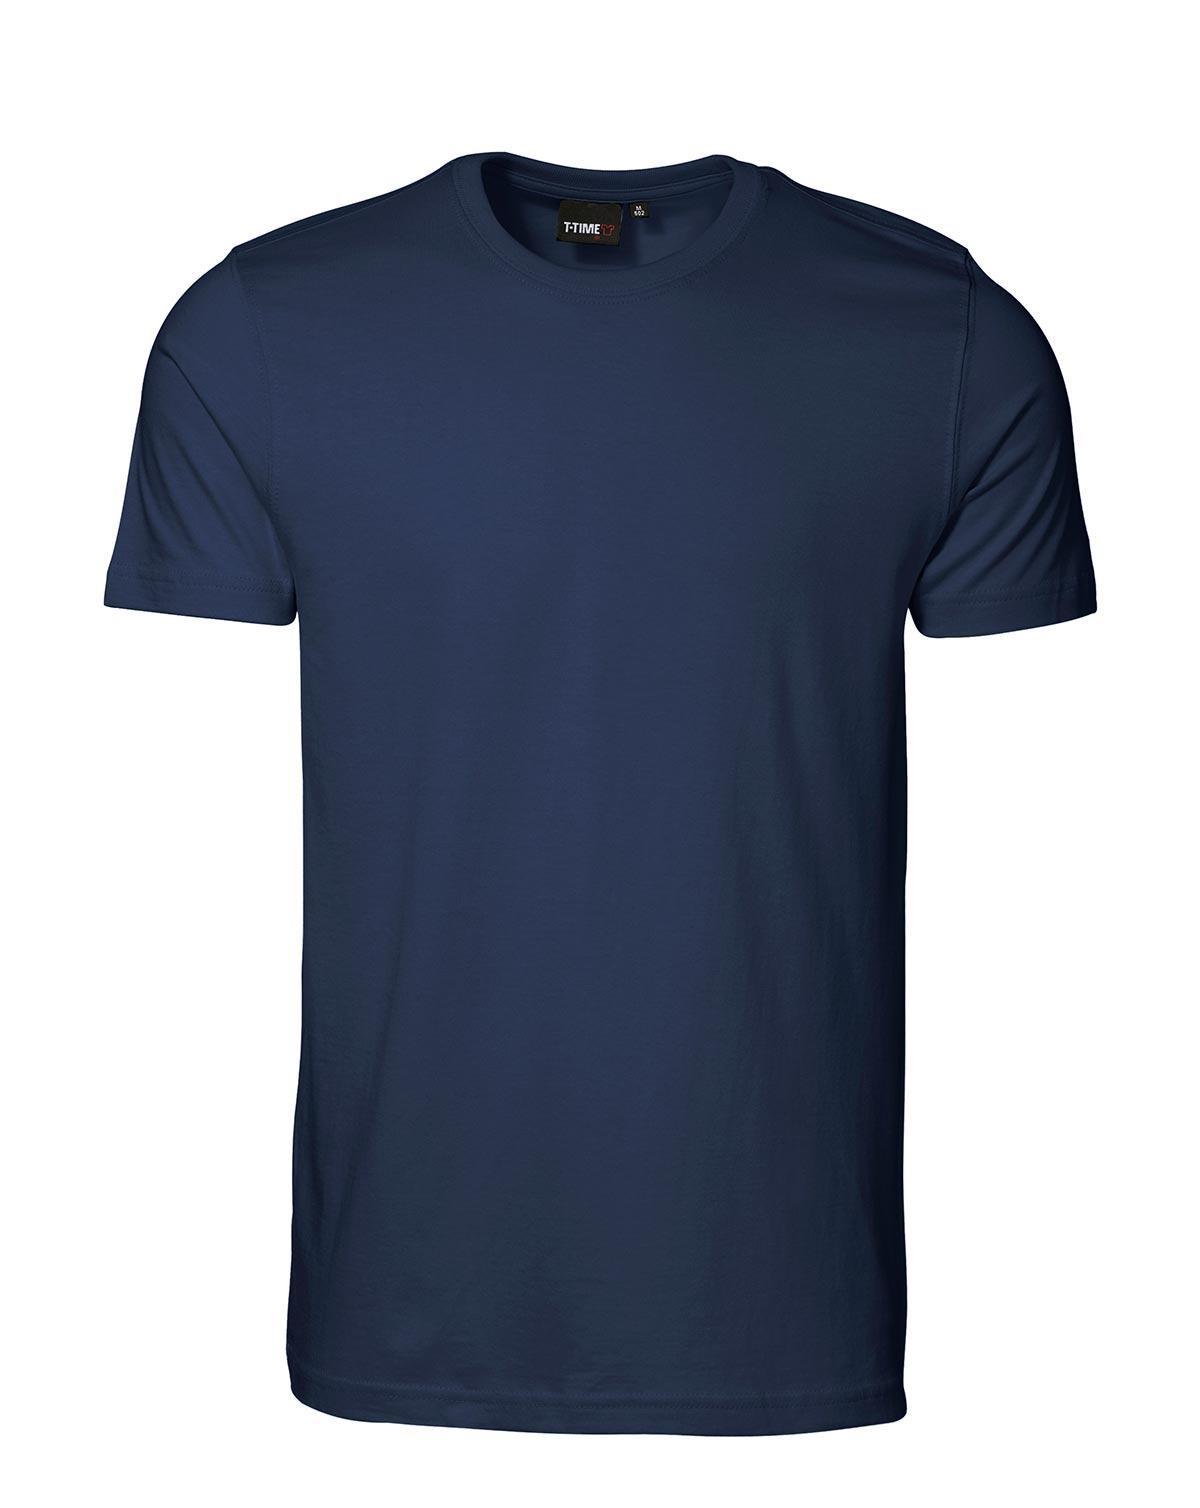 ID T-shirt, Sporty-Fit (Navy, XL)